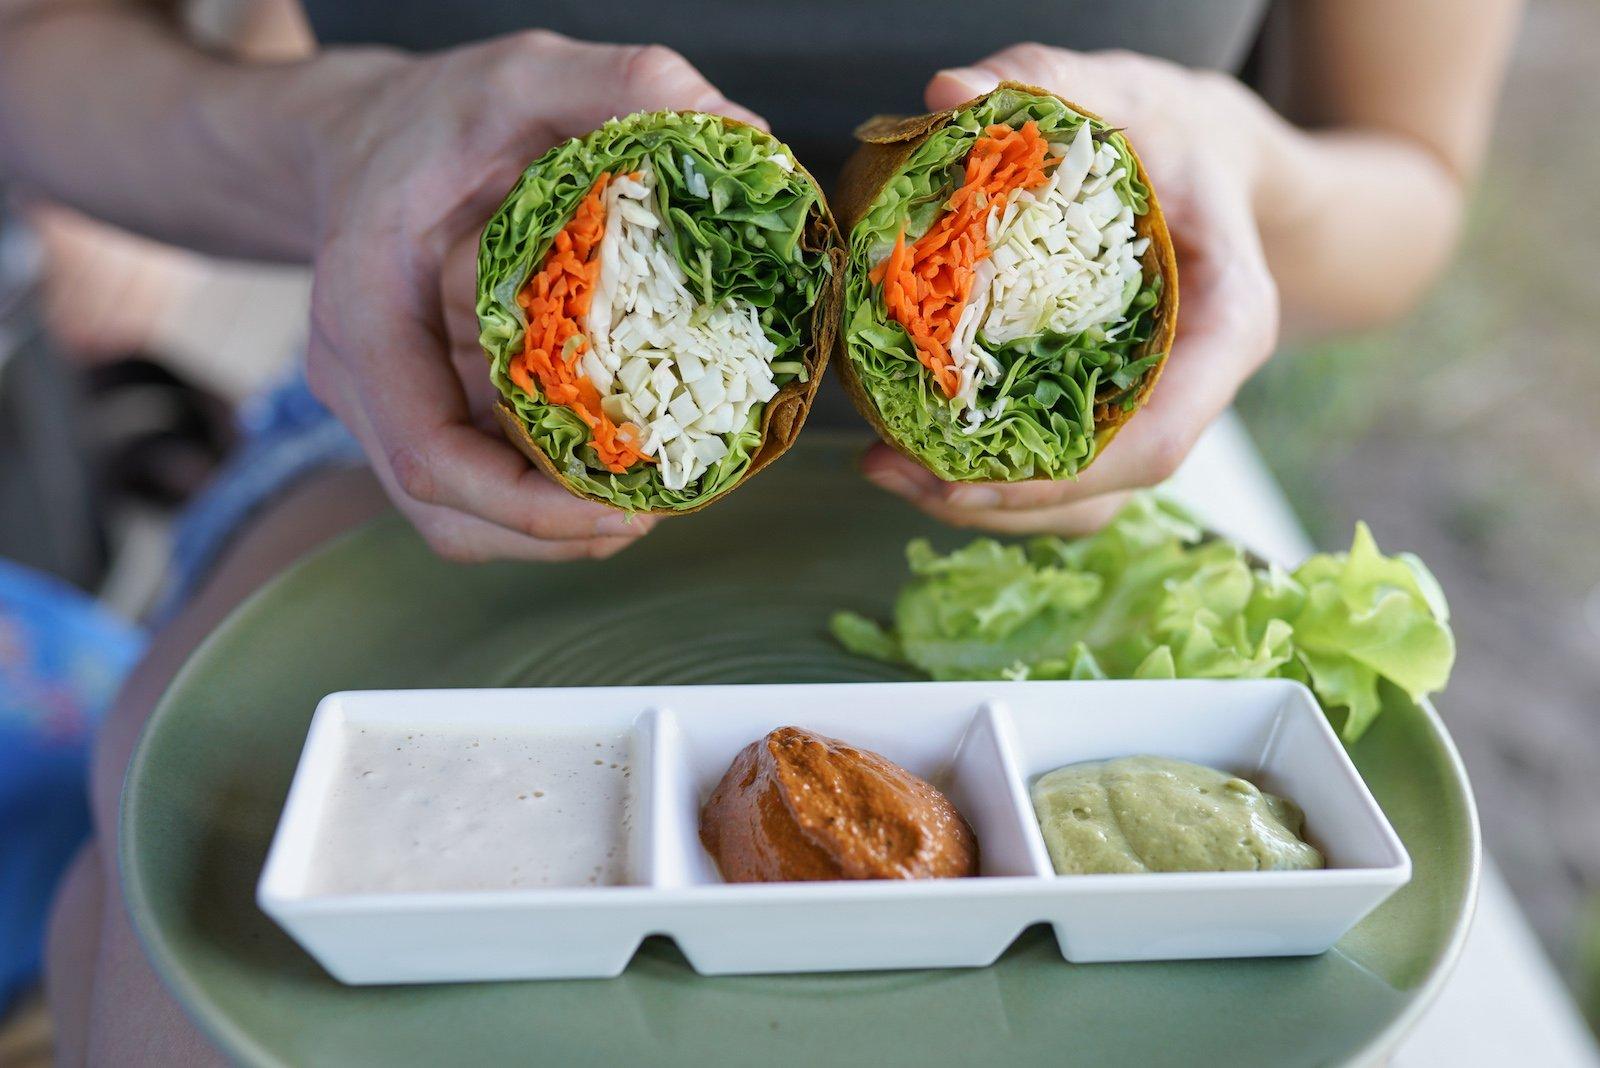 10 Strategies to Avoid Gluten in Restaurants